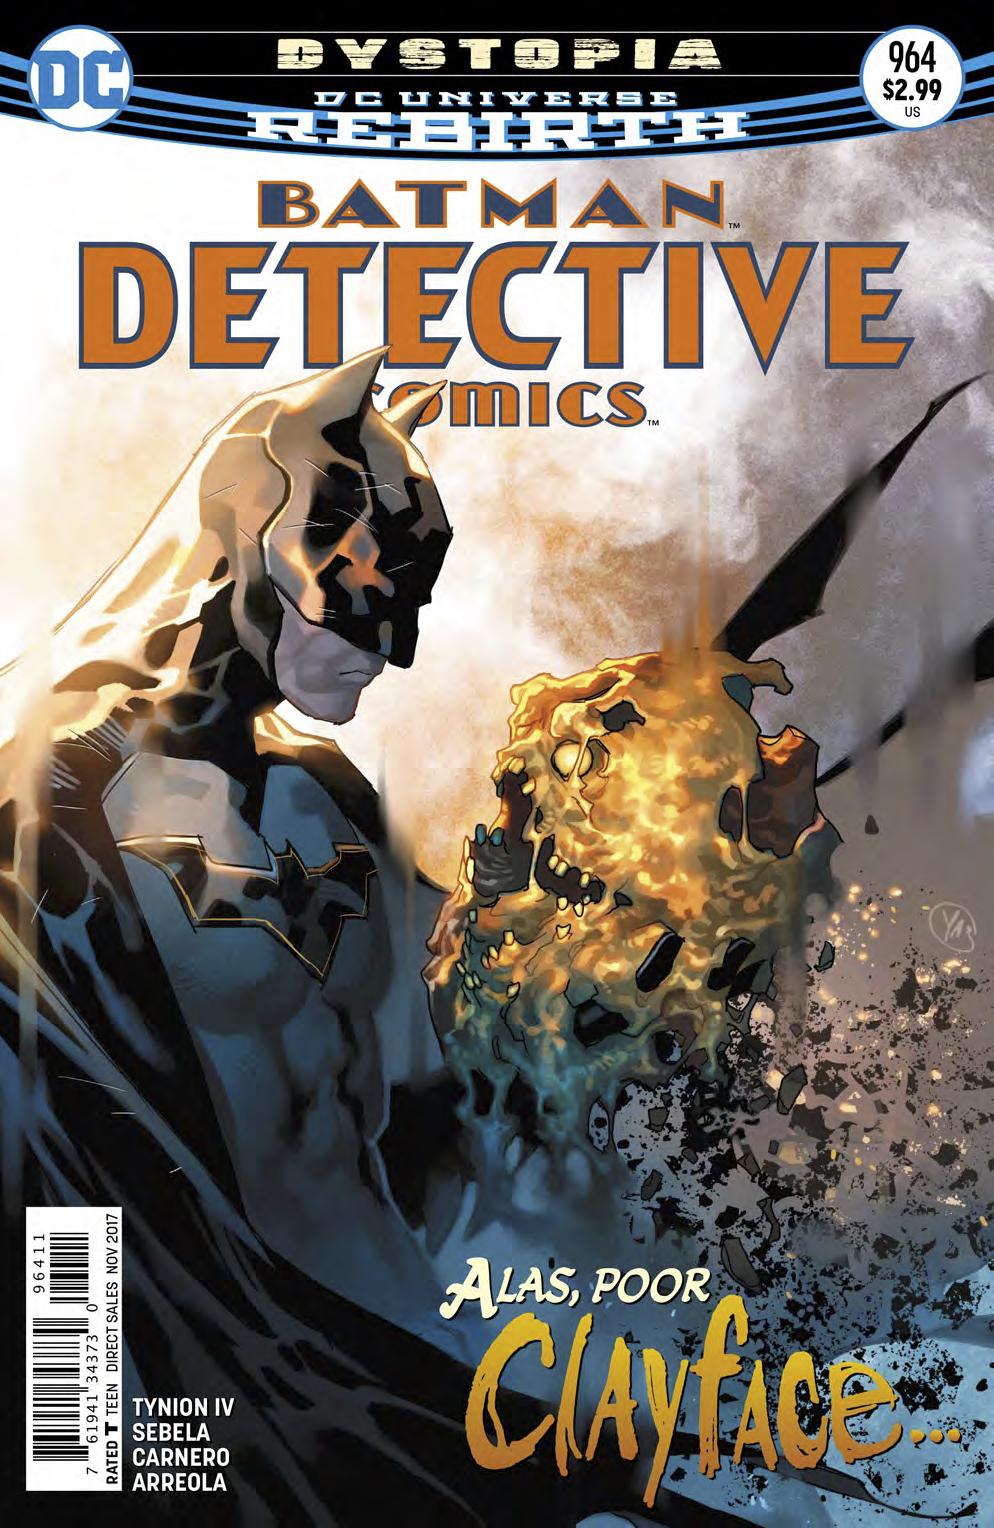 DETECTIVE COMICS #964 - cover.jpg